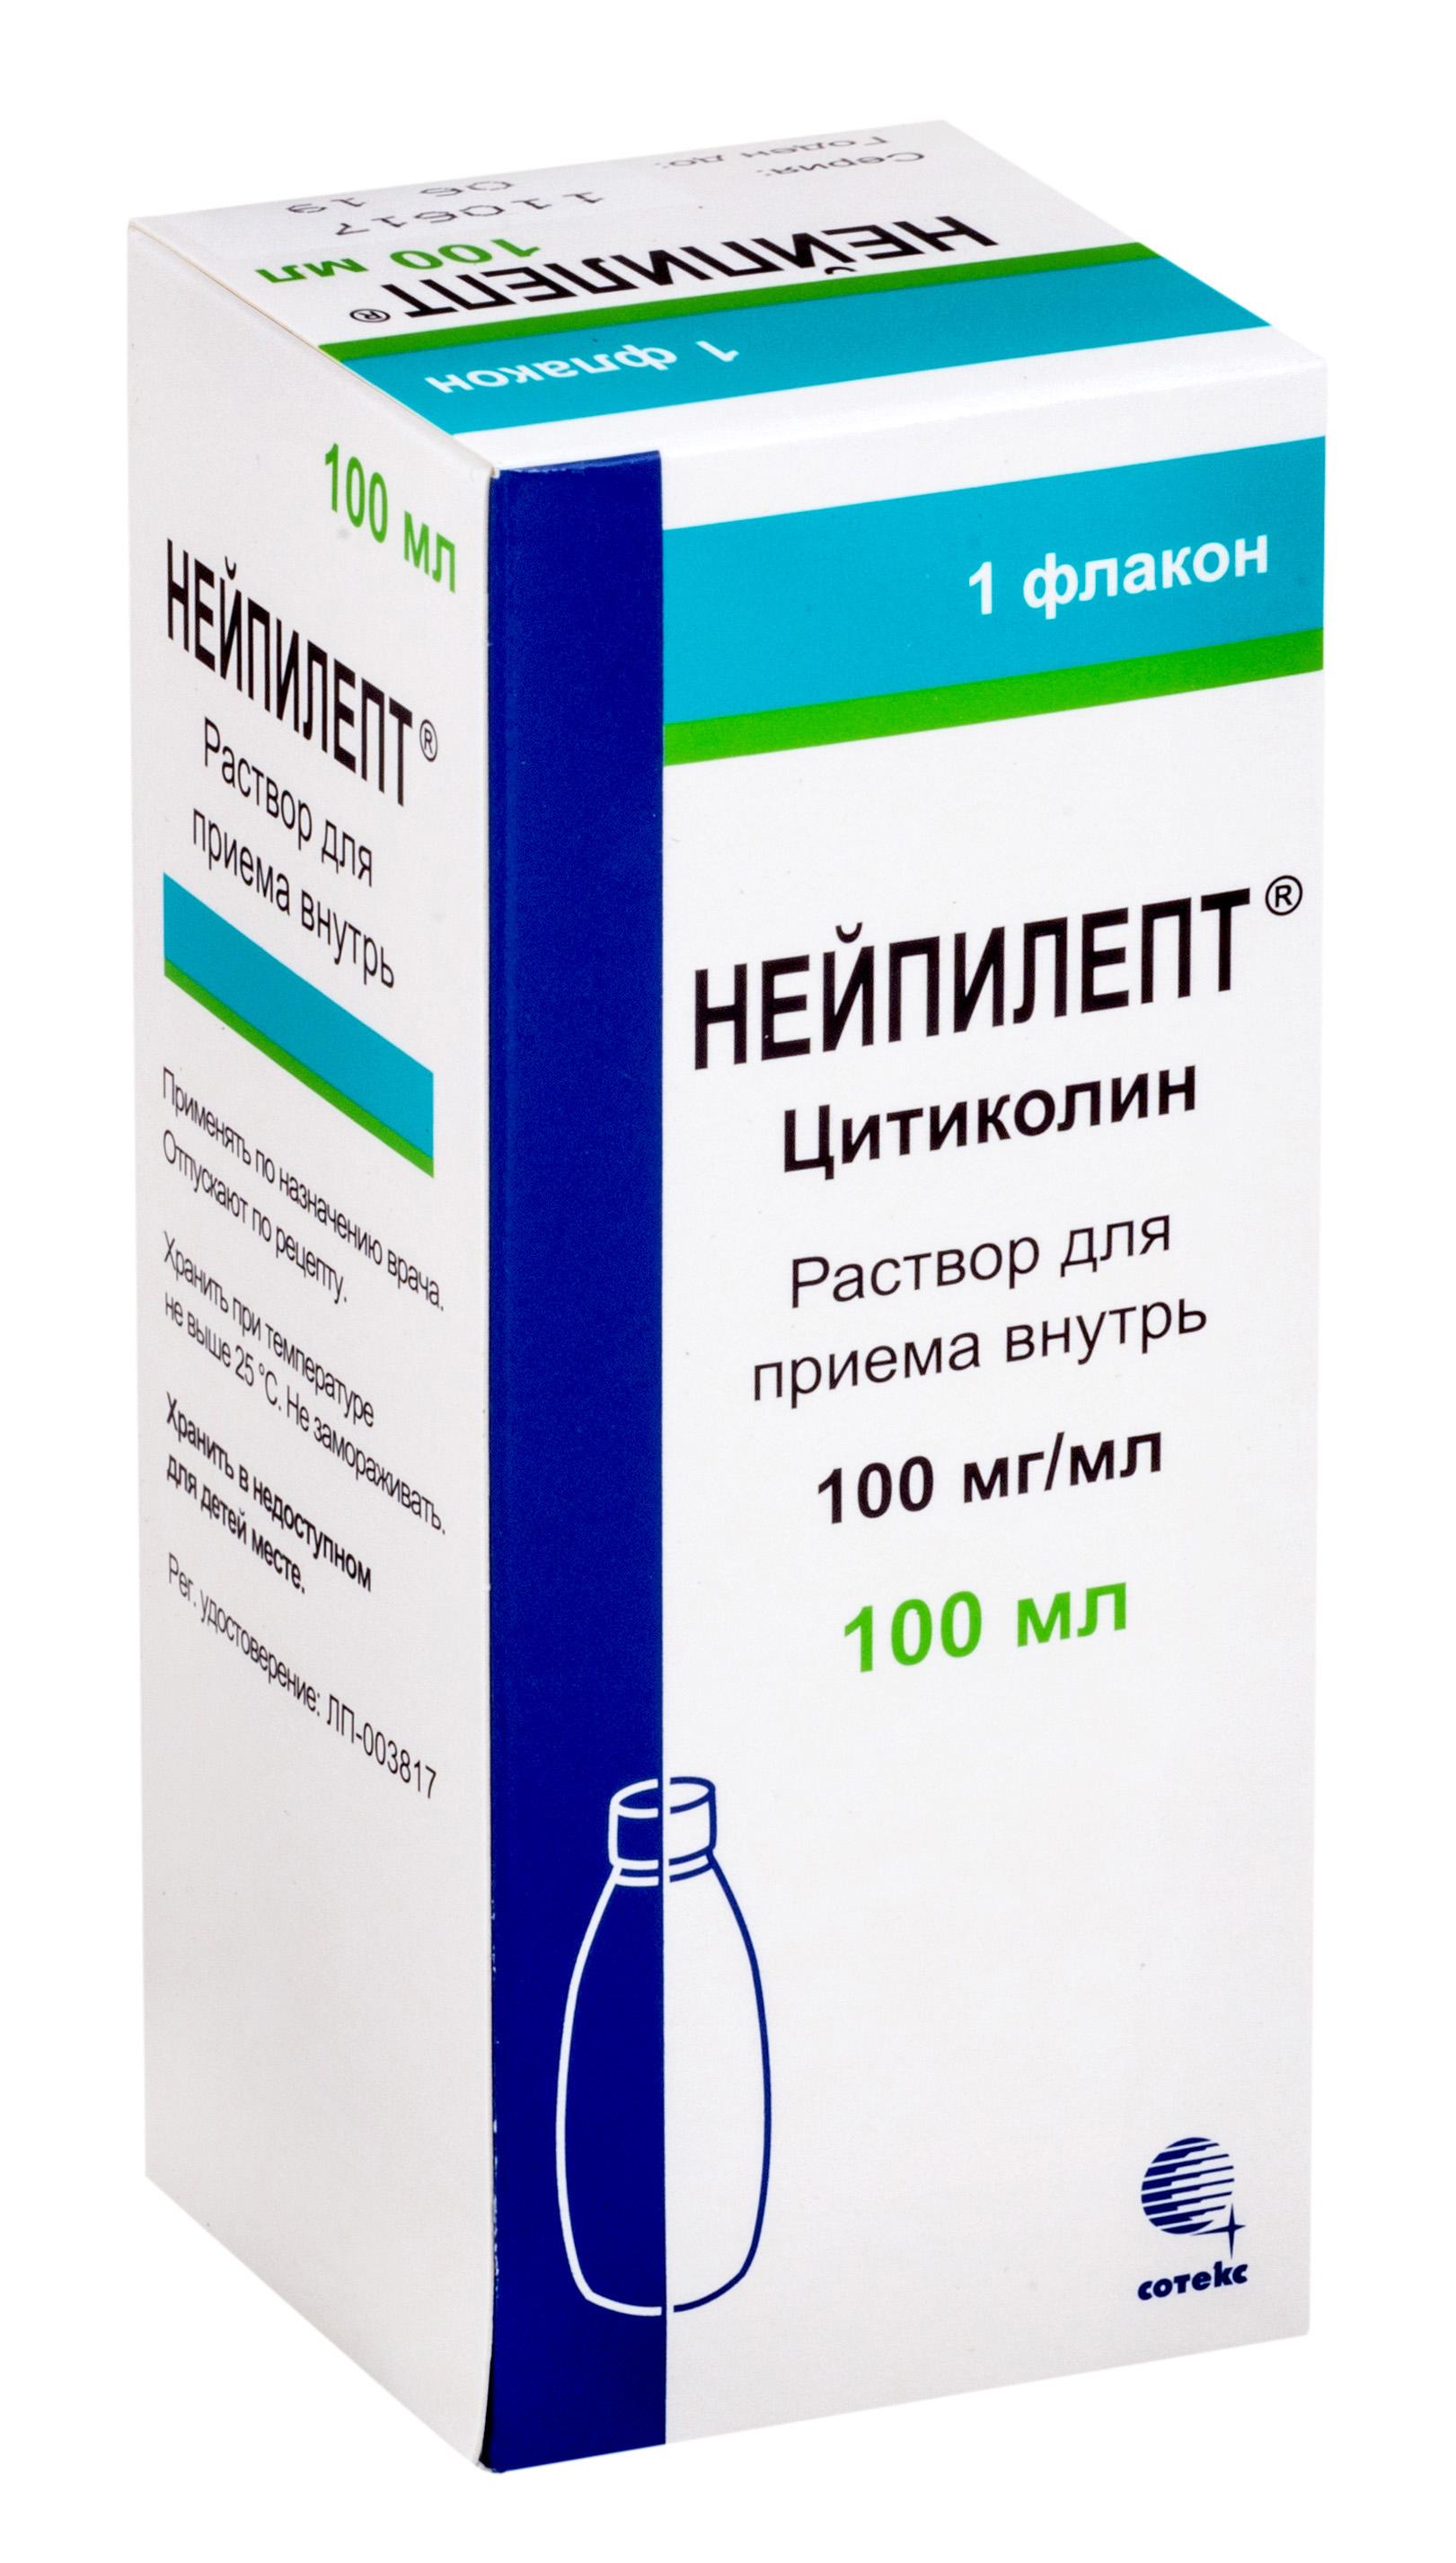 Нейпилепт р-р для приема внутрь 100мг/мл 100мл